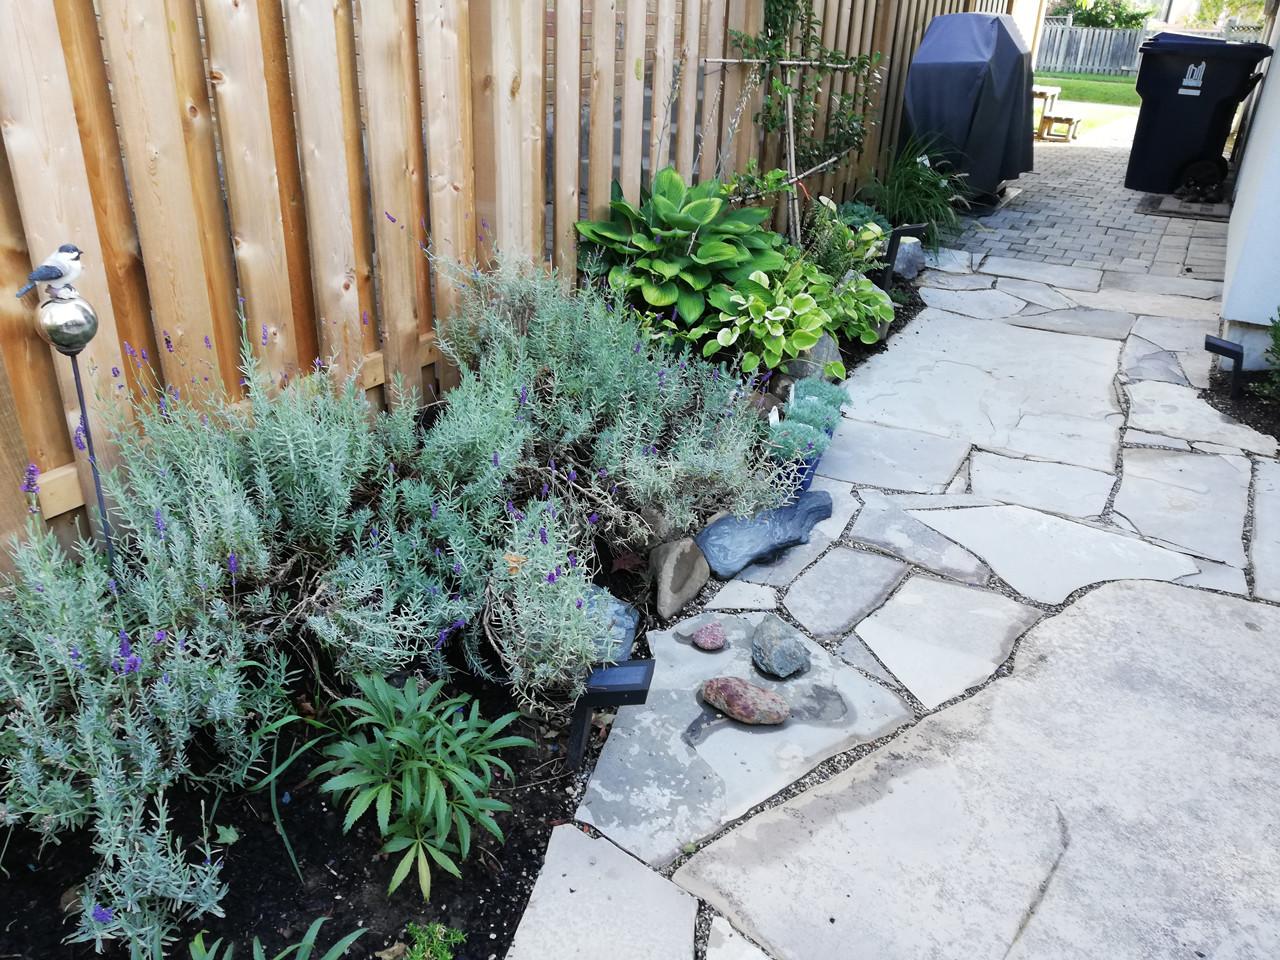 Garden landscape by patio